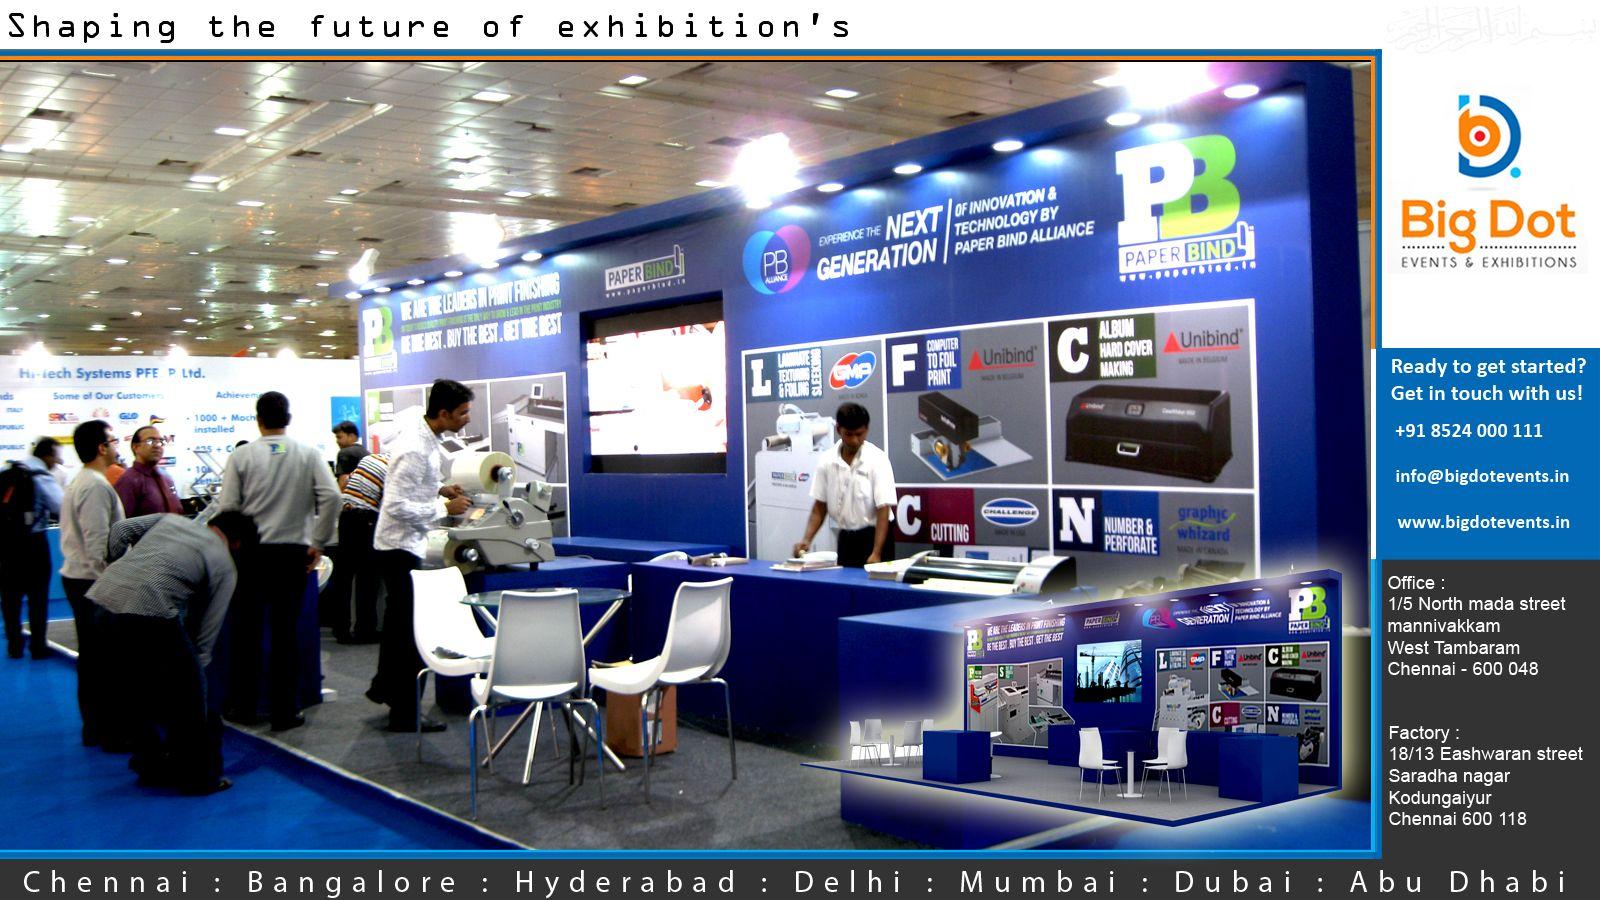 Exhibition Stall Fabricators Hyderabad : Exhibition stall fabricators in chennai exhibition stall design and